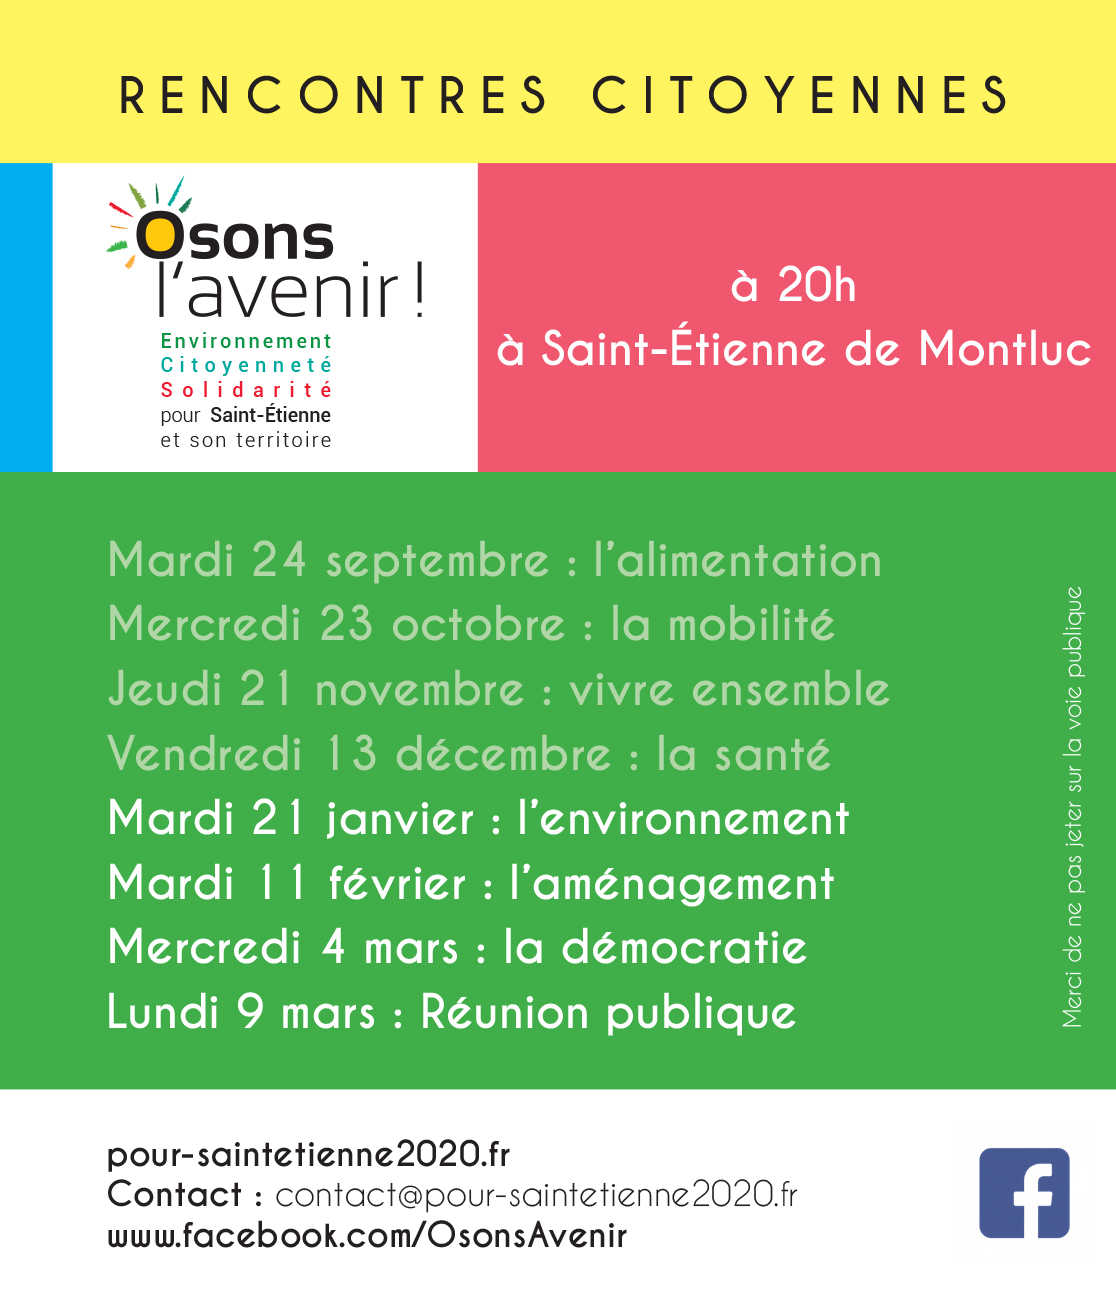 Dates rencontres citoyennes